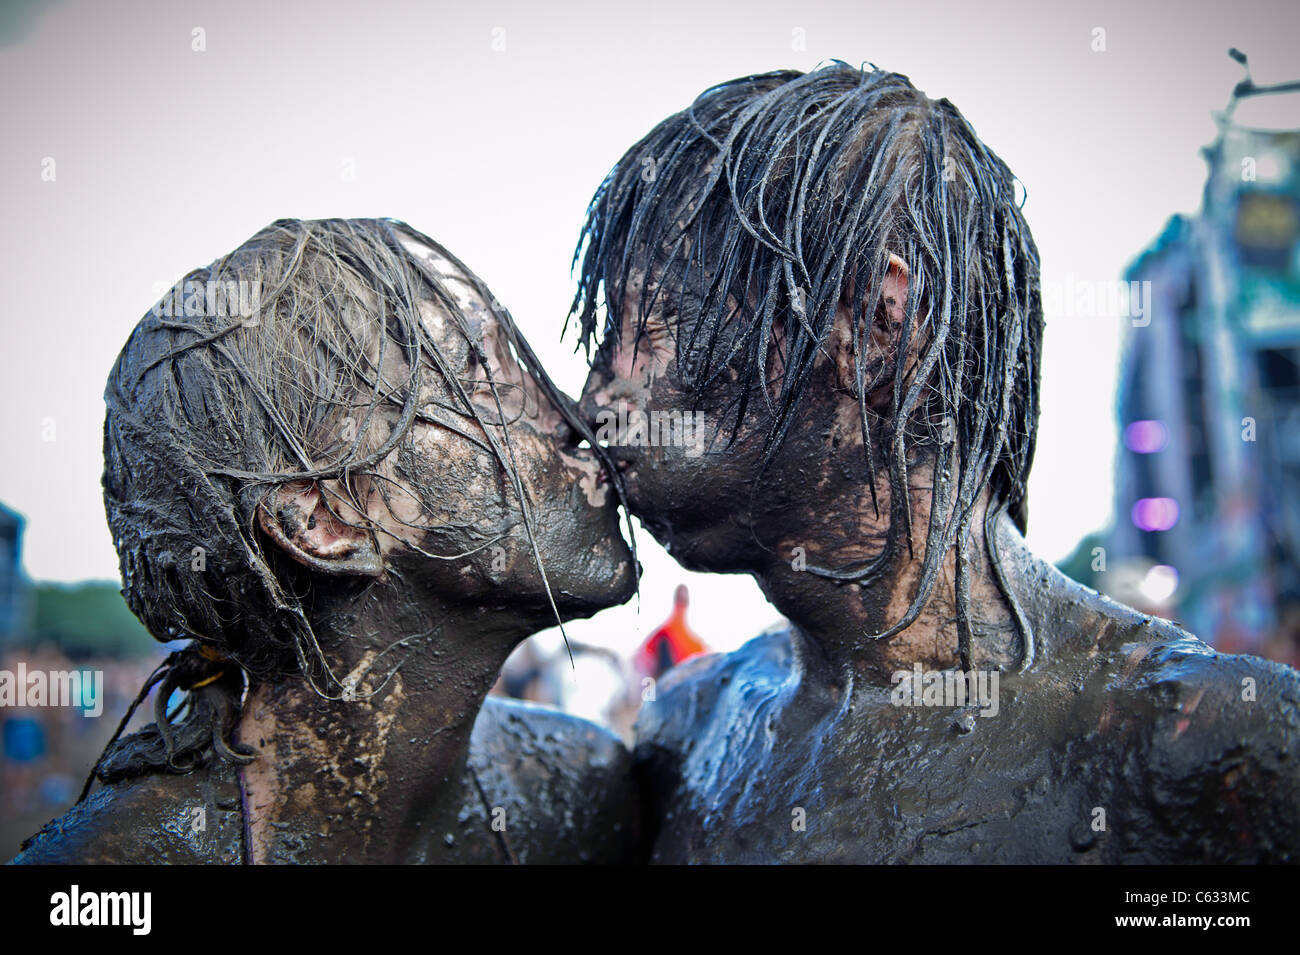 junges Paar küssen bedeckt im Schlamm am Przystanek Woodstock - Europas größtes Open-Air-Festival in Kostrzyn, Polen Stockfoto